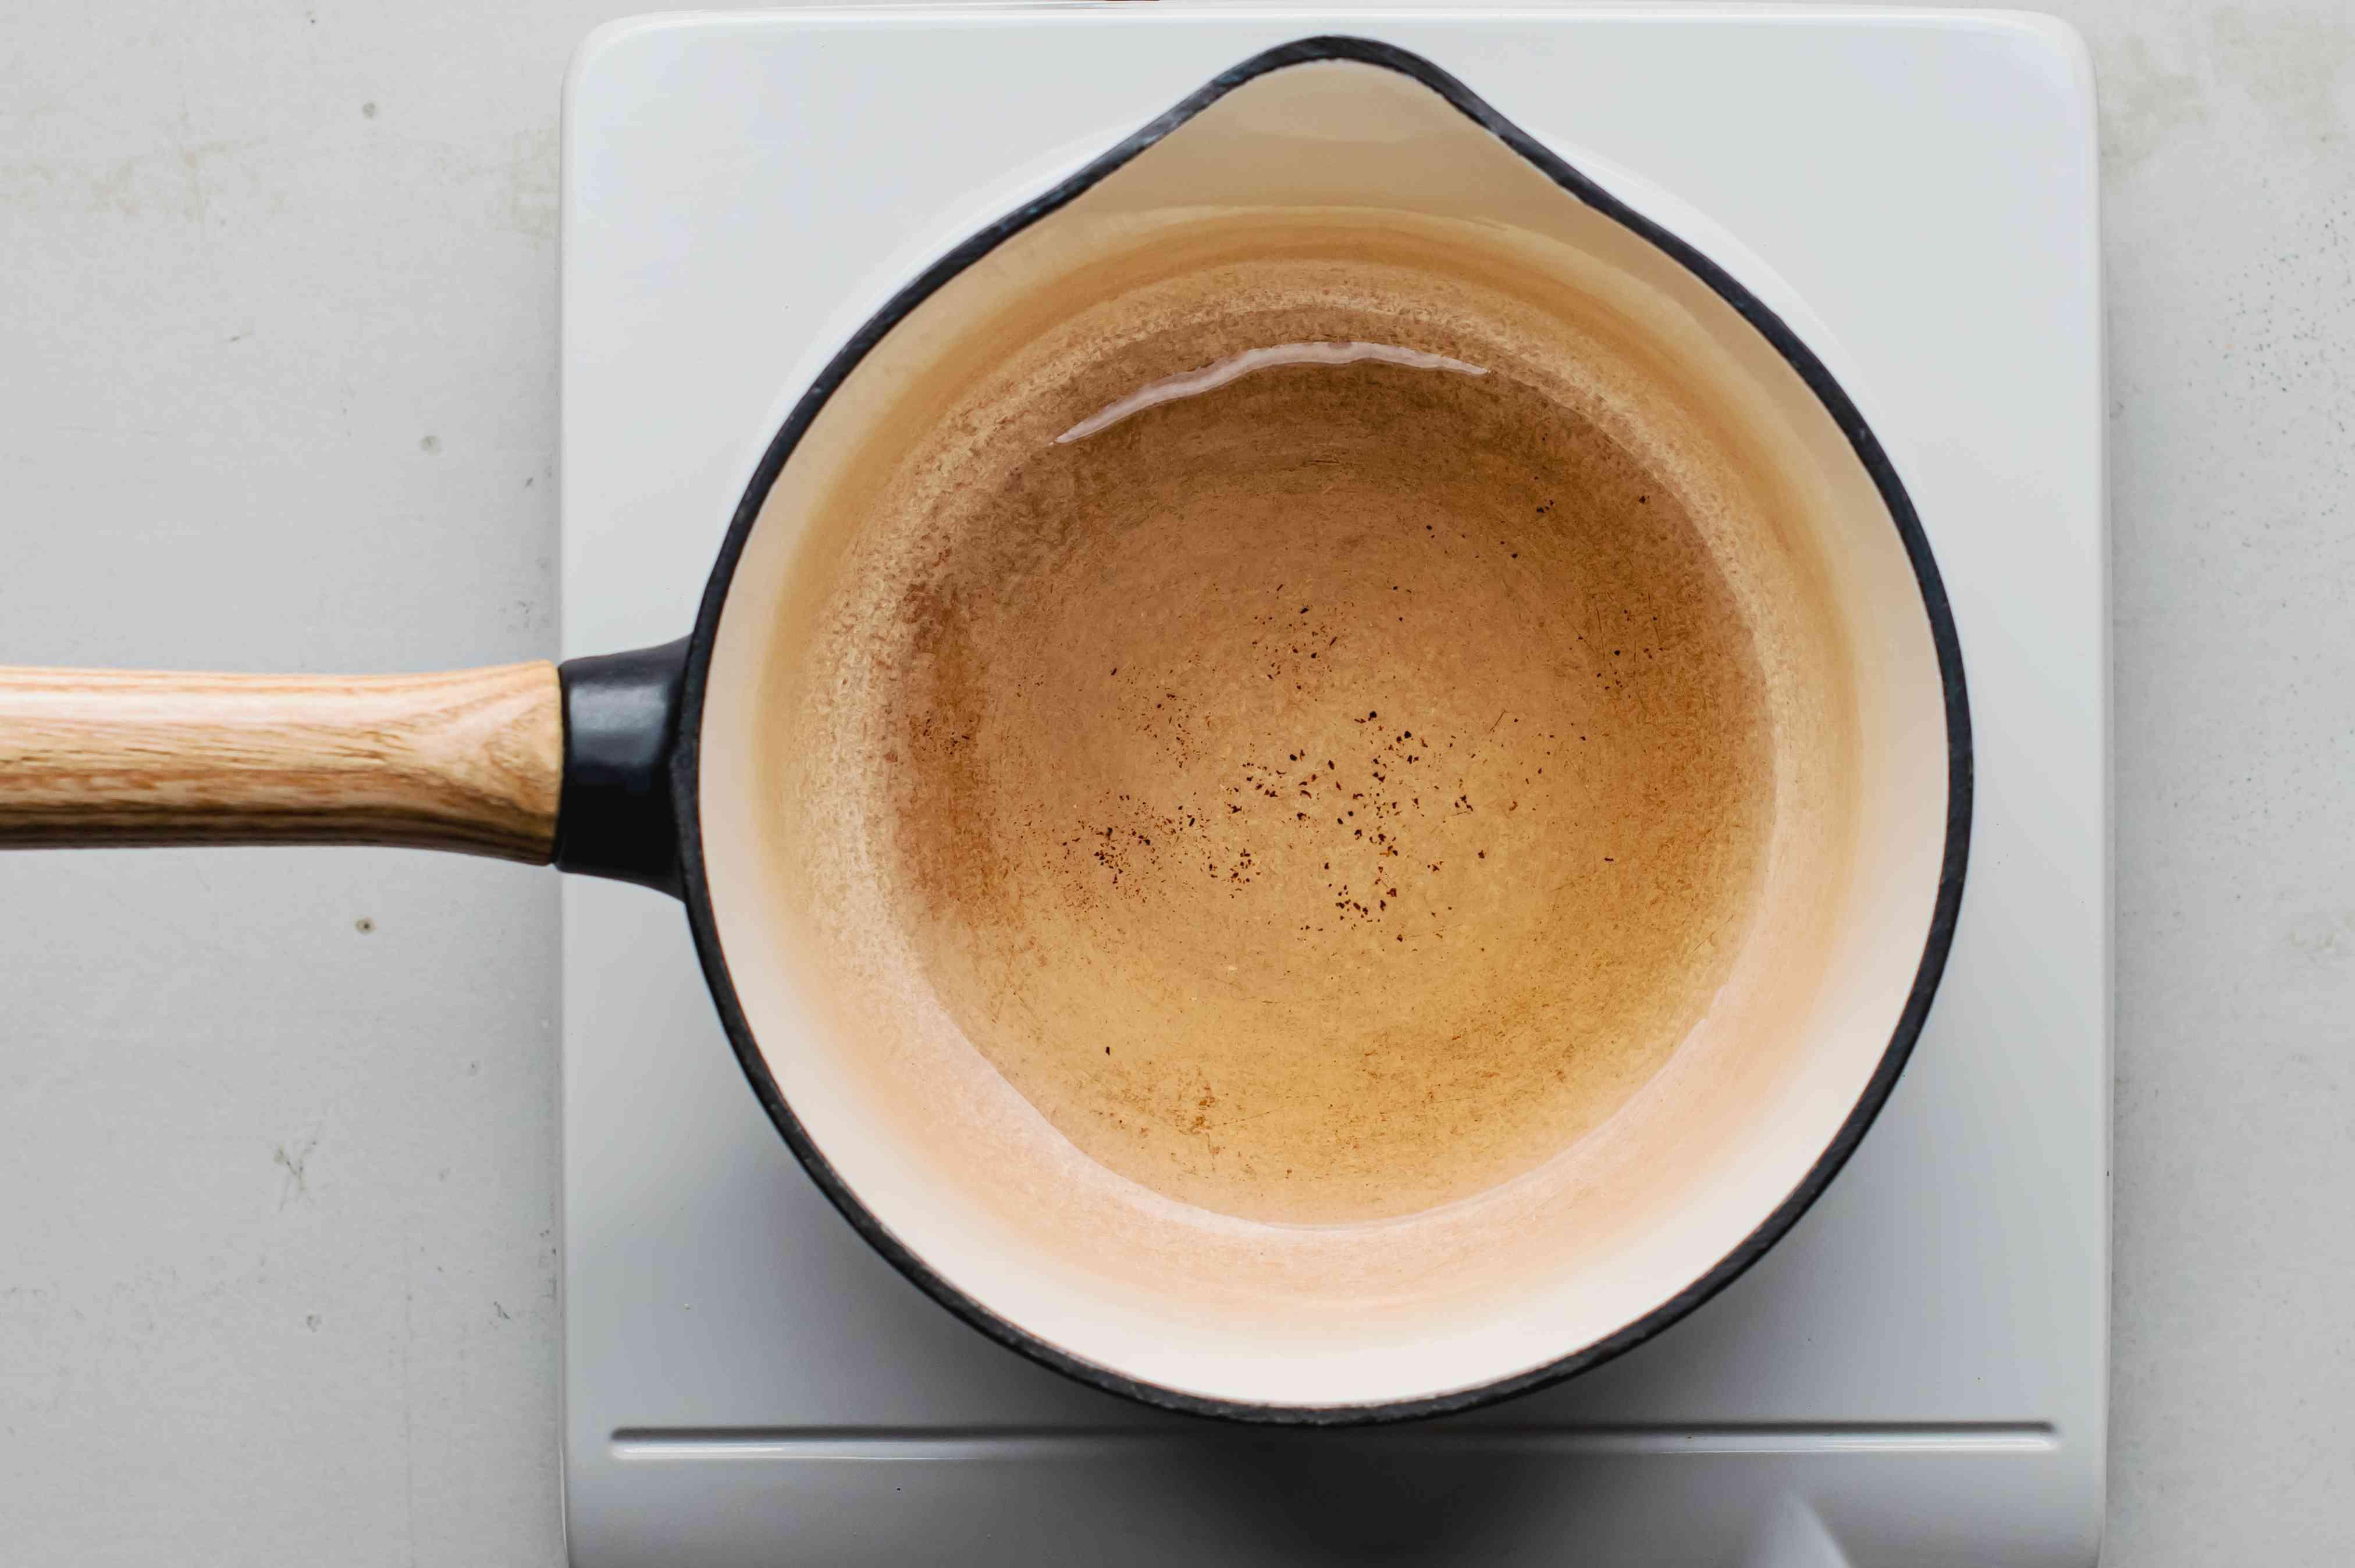 Bacon drippings in a saucepan on medium-low heat